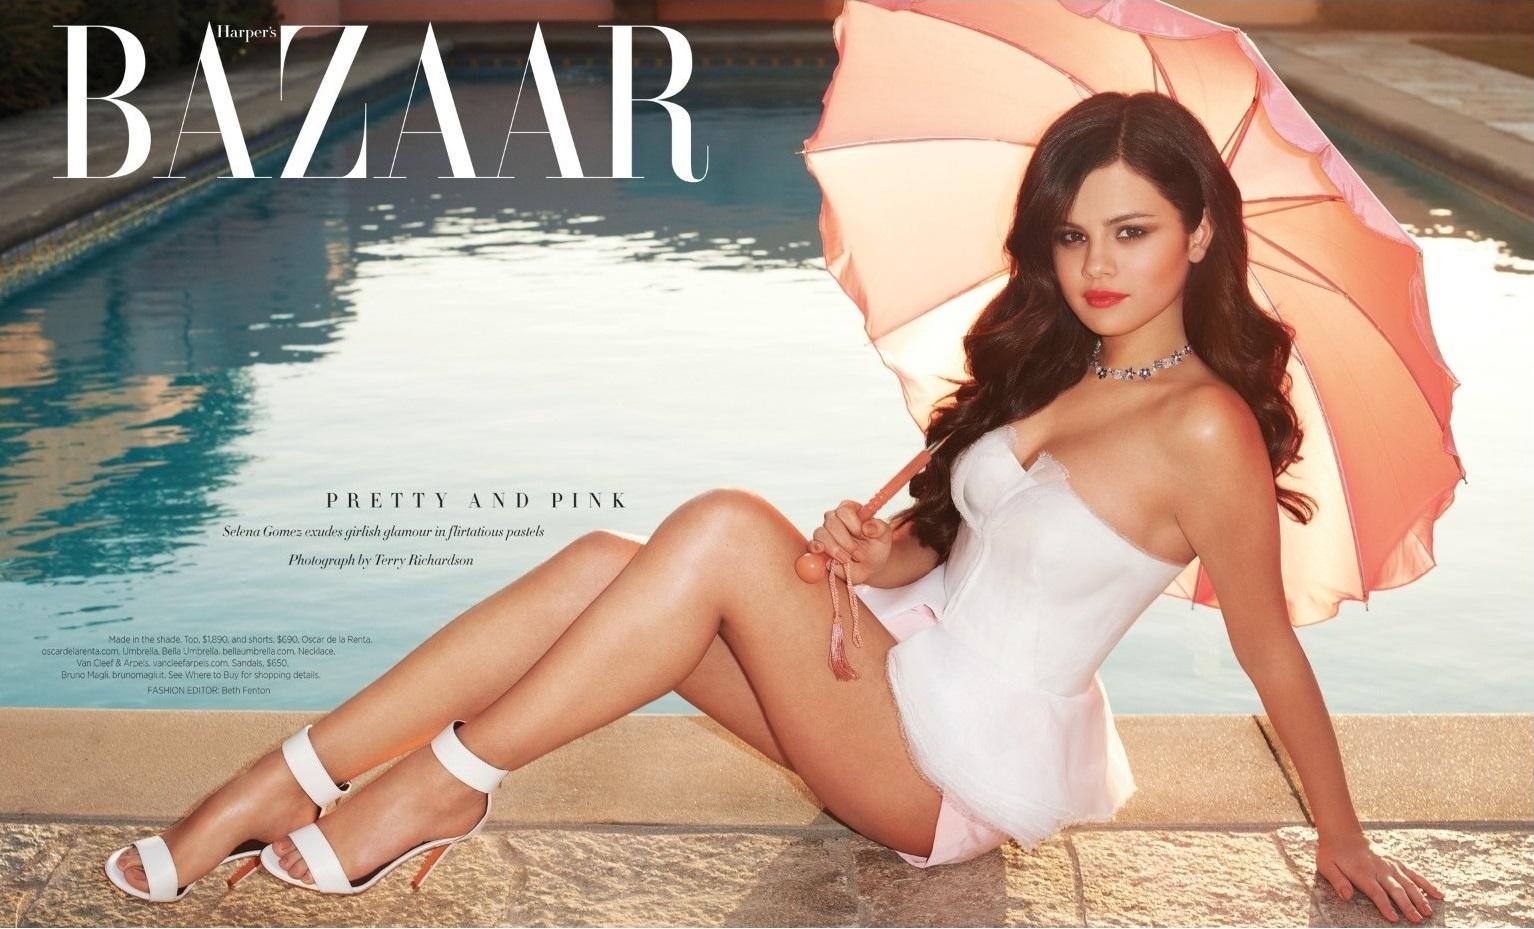 http://2.bp.blogspot.com/-LlXpth7YS9Y/UYK9Bfpp0NI/AAAAAAAAyFE/jfue9bv171k/s1600/Selena-Gomez-Harpers-Bazaar-2013-05.jpg